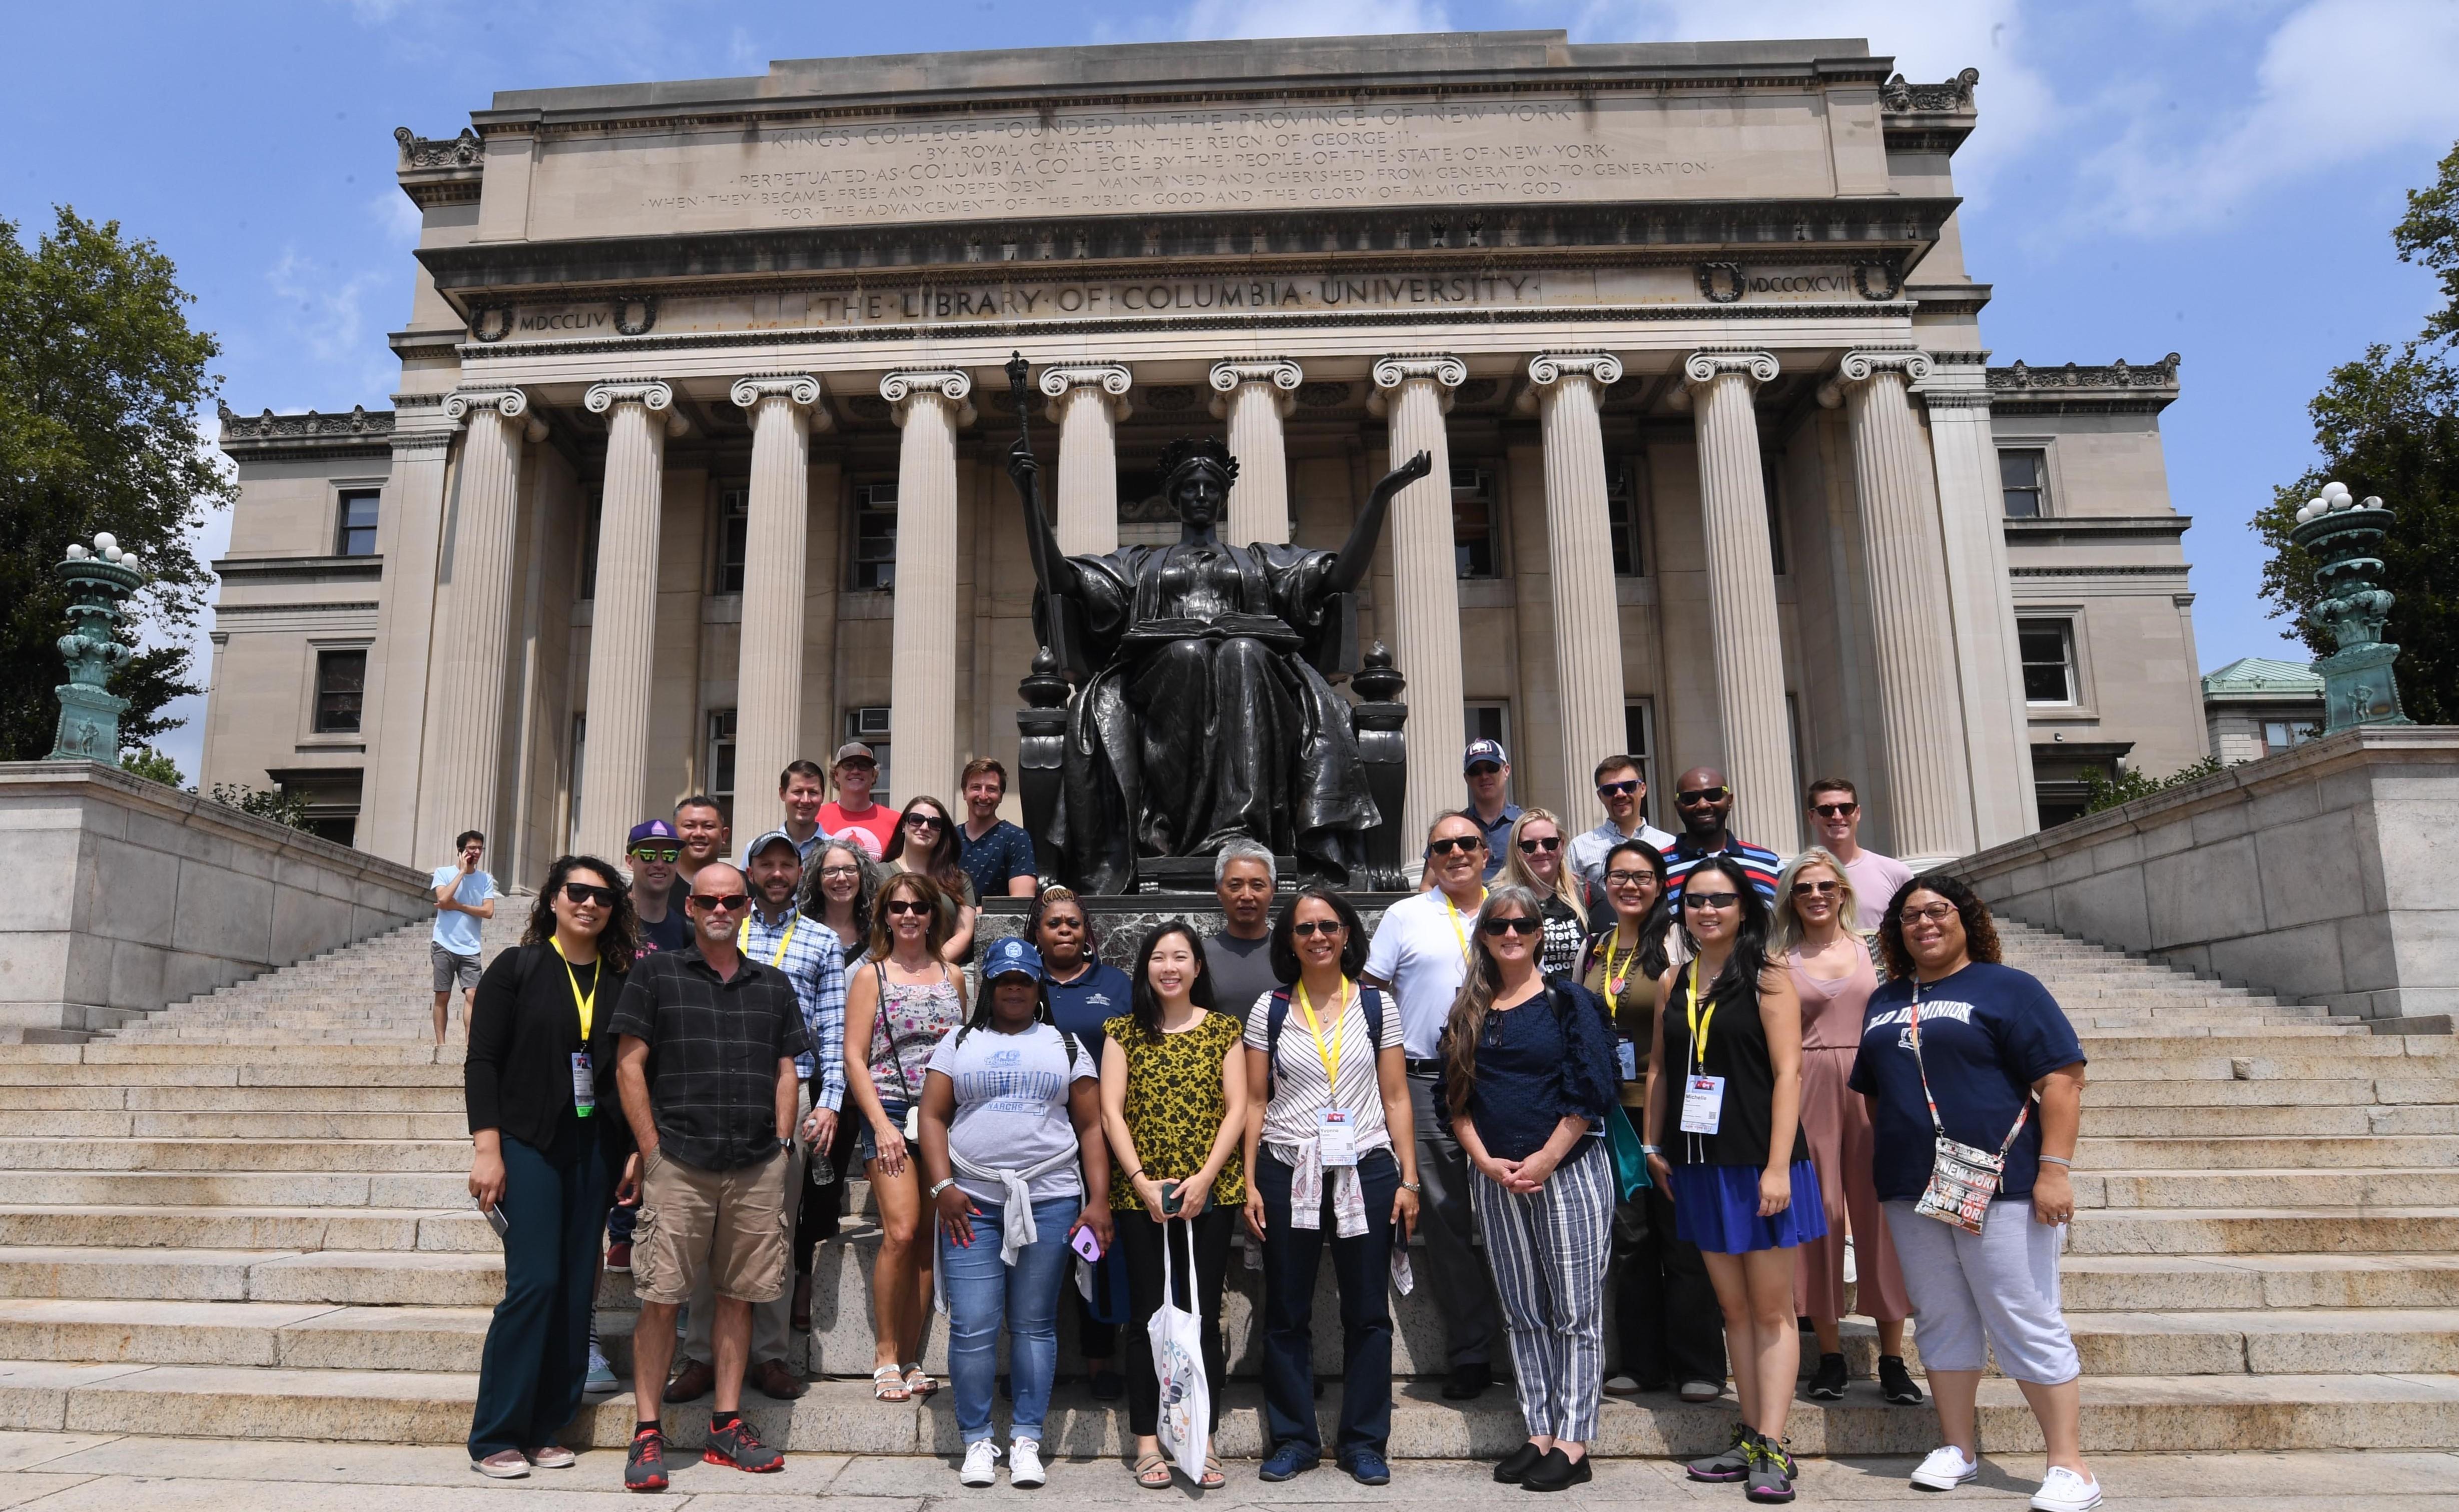 Columbia University TDM Tour group photo